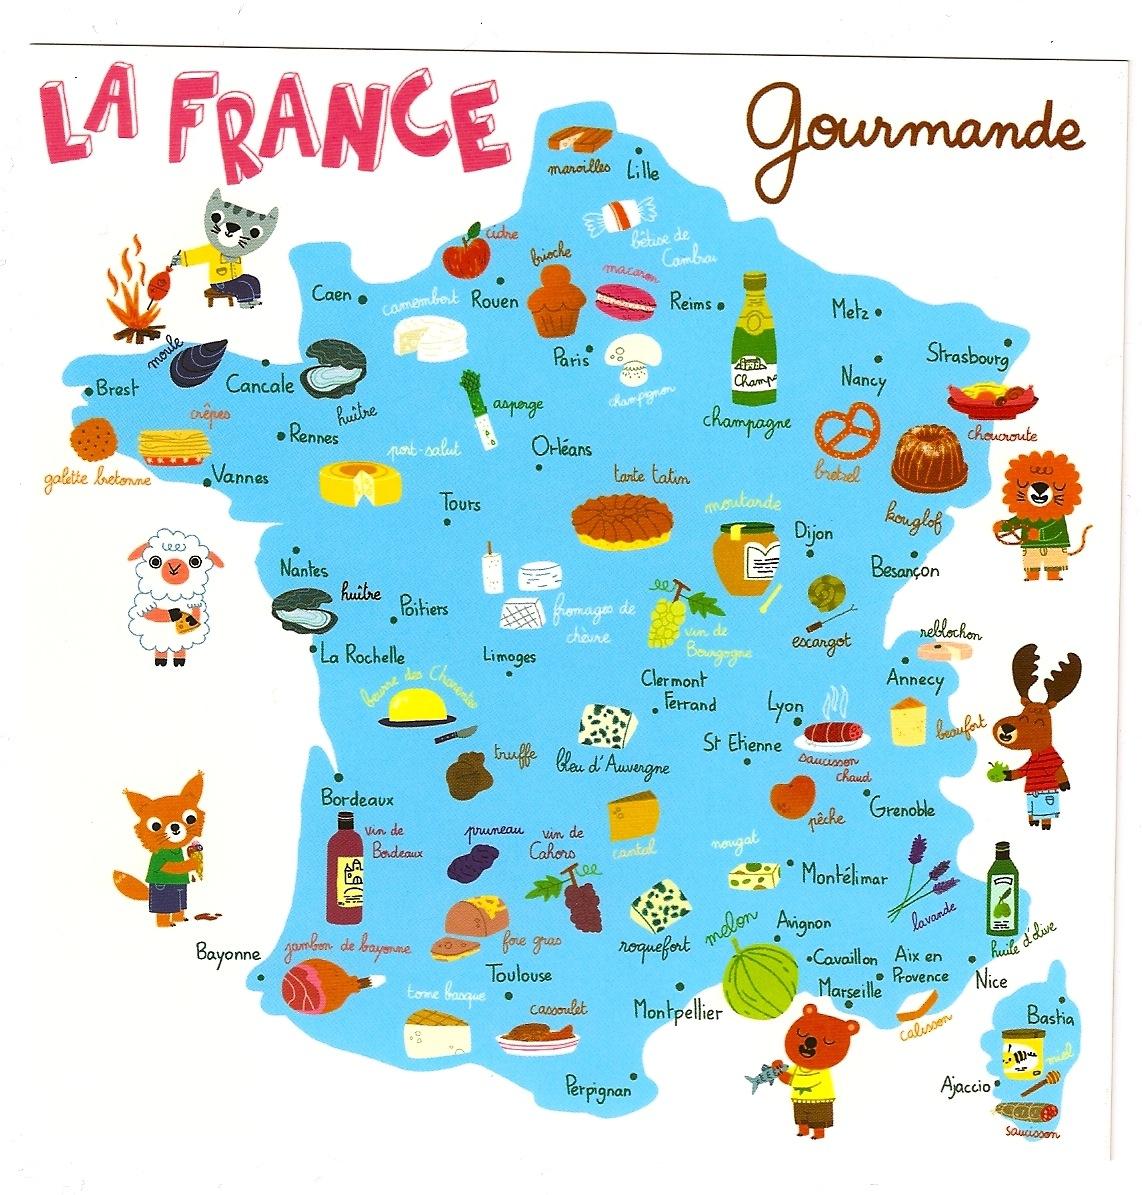 All Points Delicious In France avec Carte De Region France